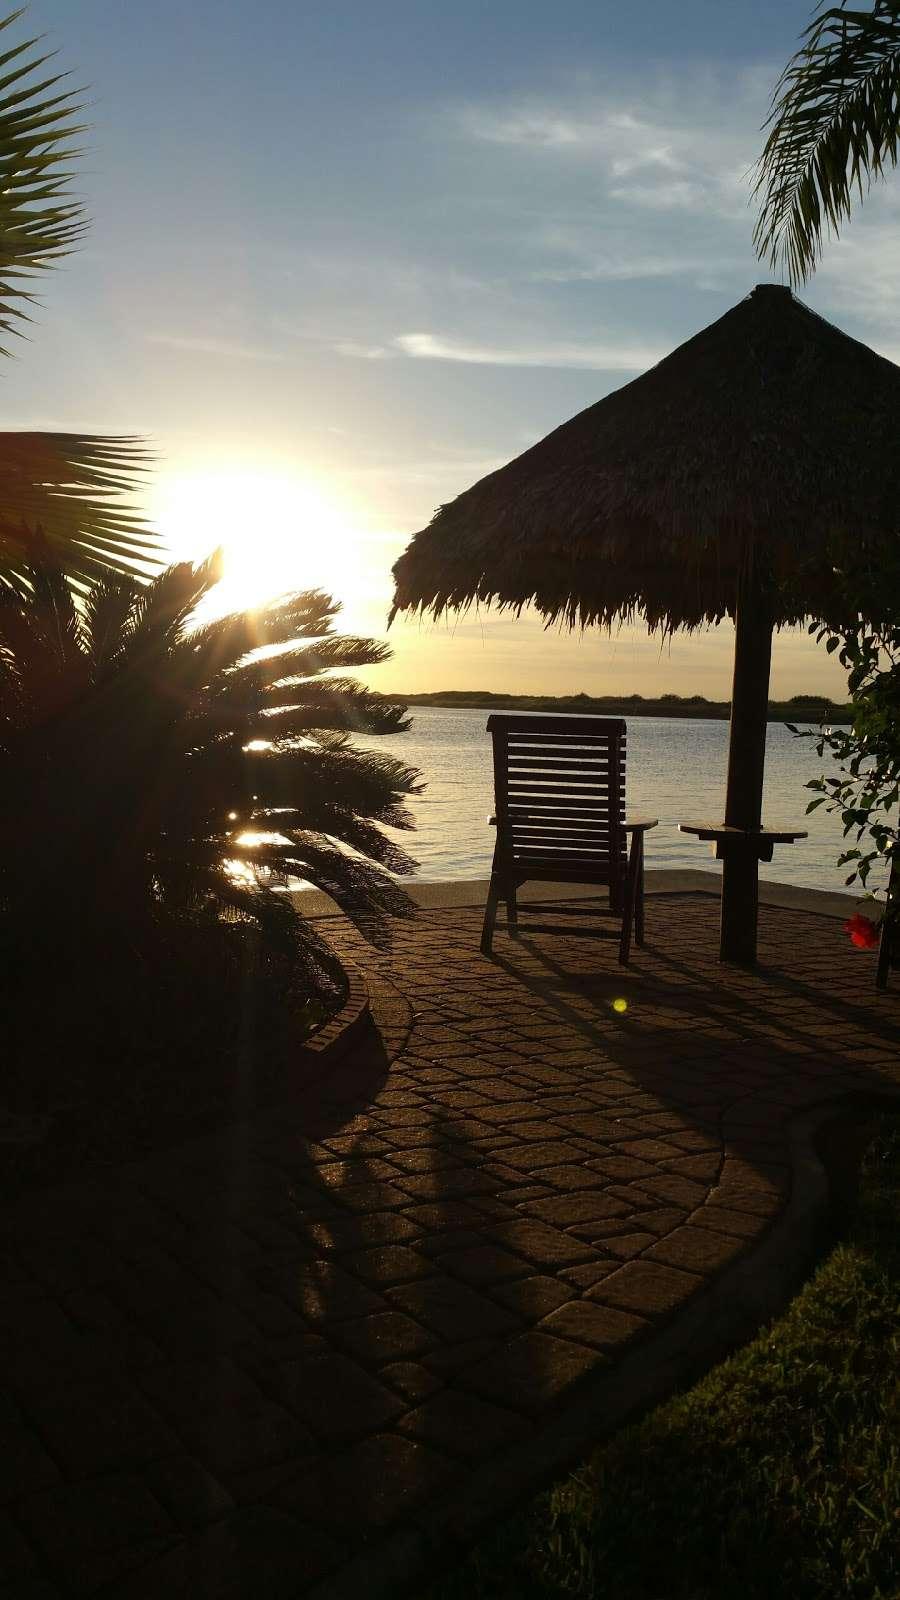 Crystal Beach Villa - lodging  | Photo 10 of 10 | Address: 1300 N Crystal Beach Rd, Crystal Beach, TX 77650, USA | Phone: (409) 682-8579